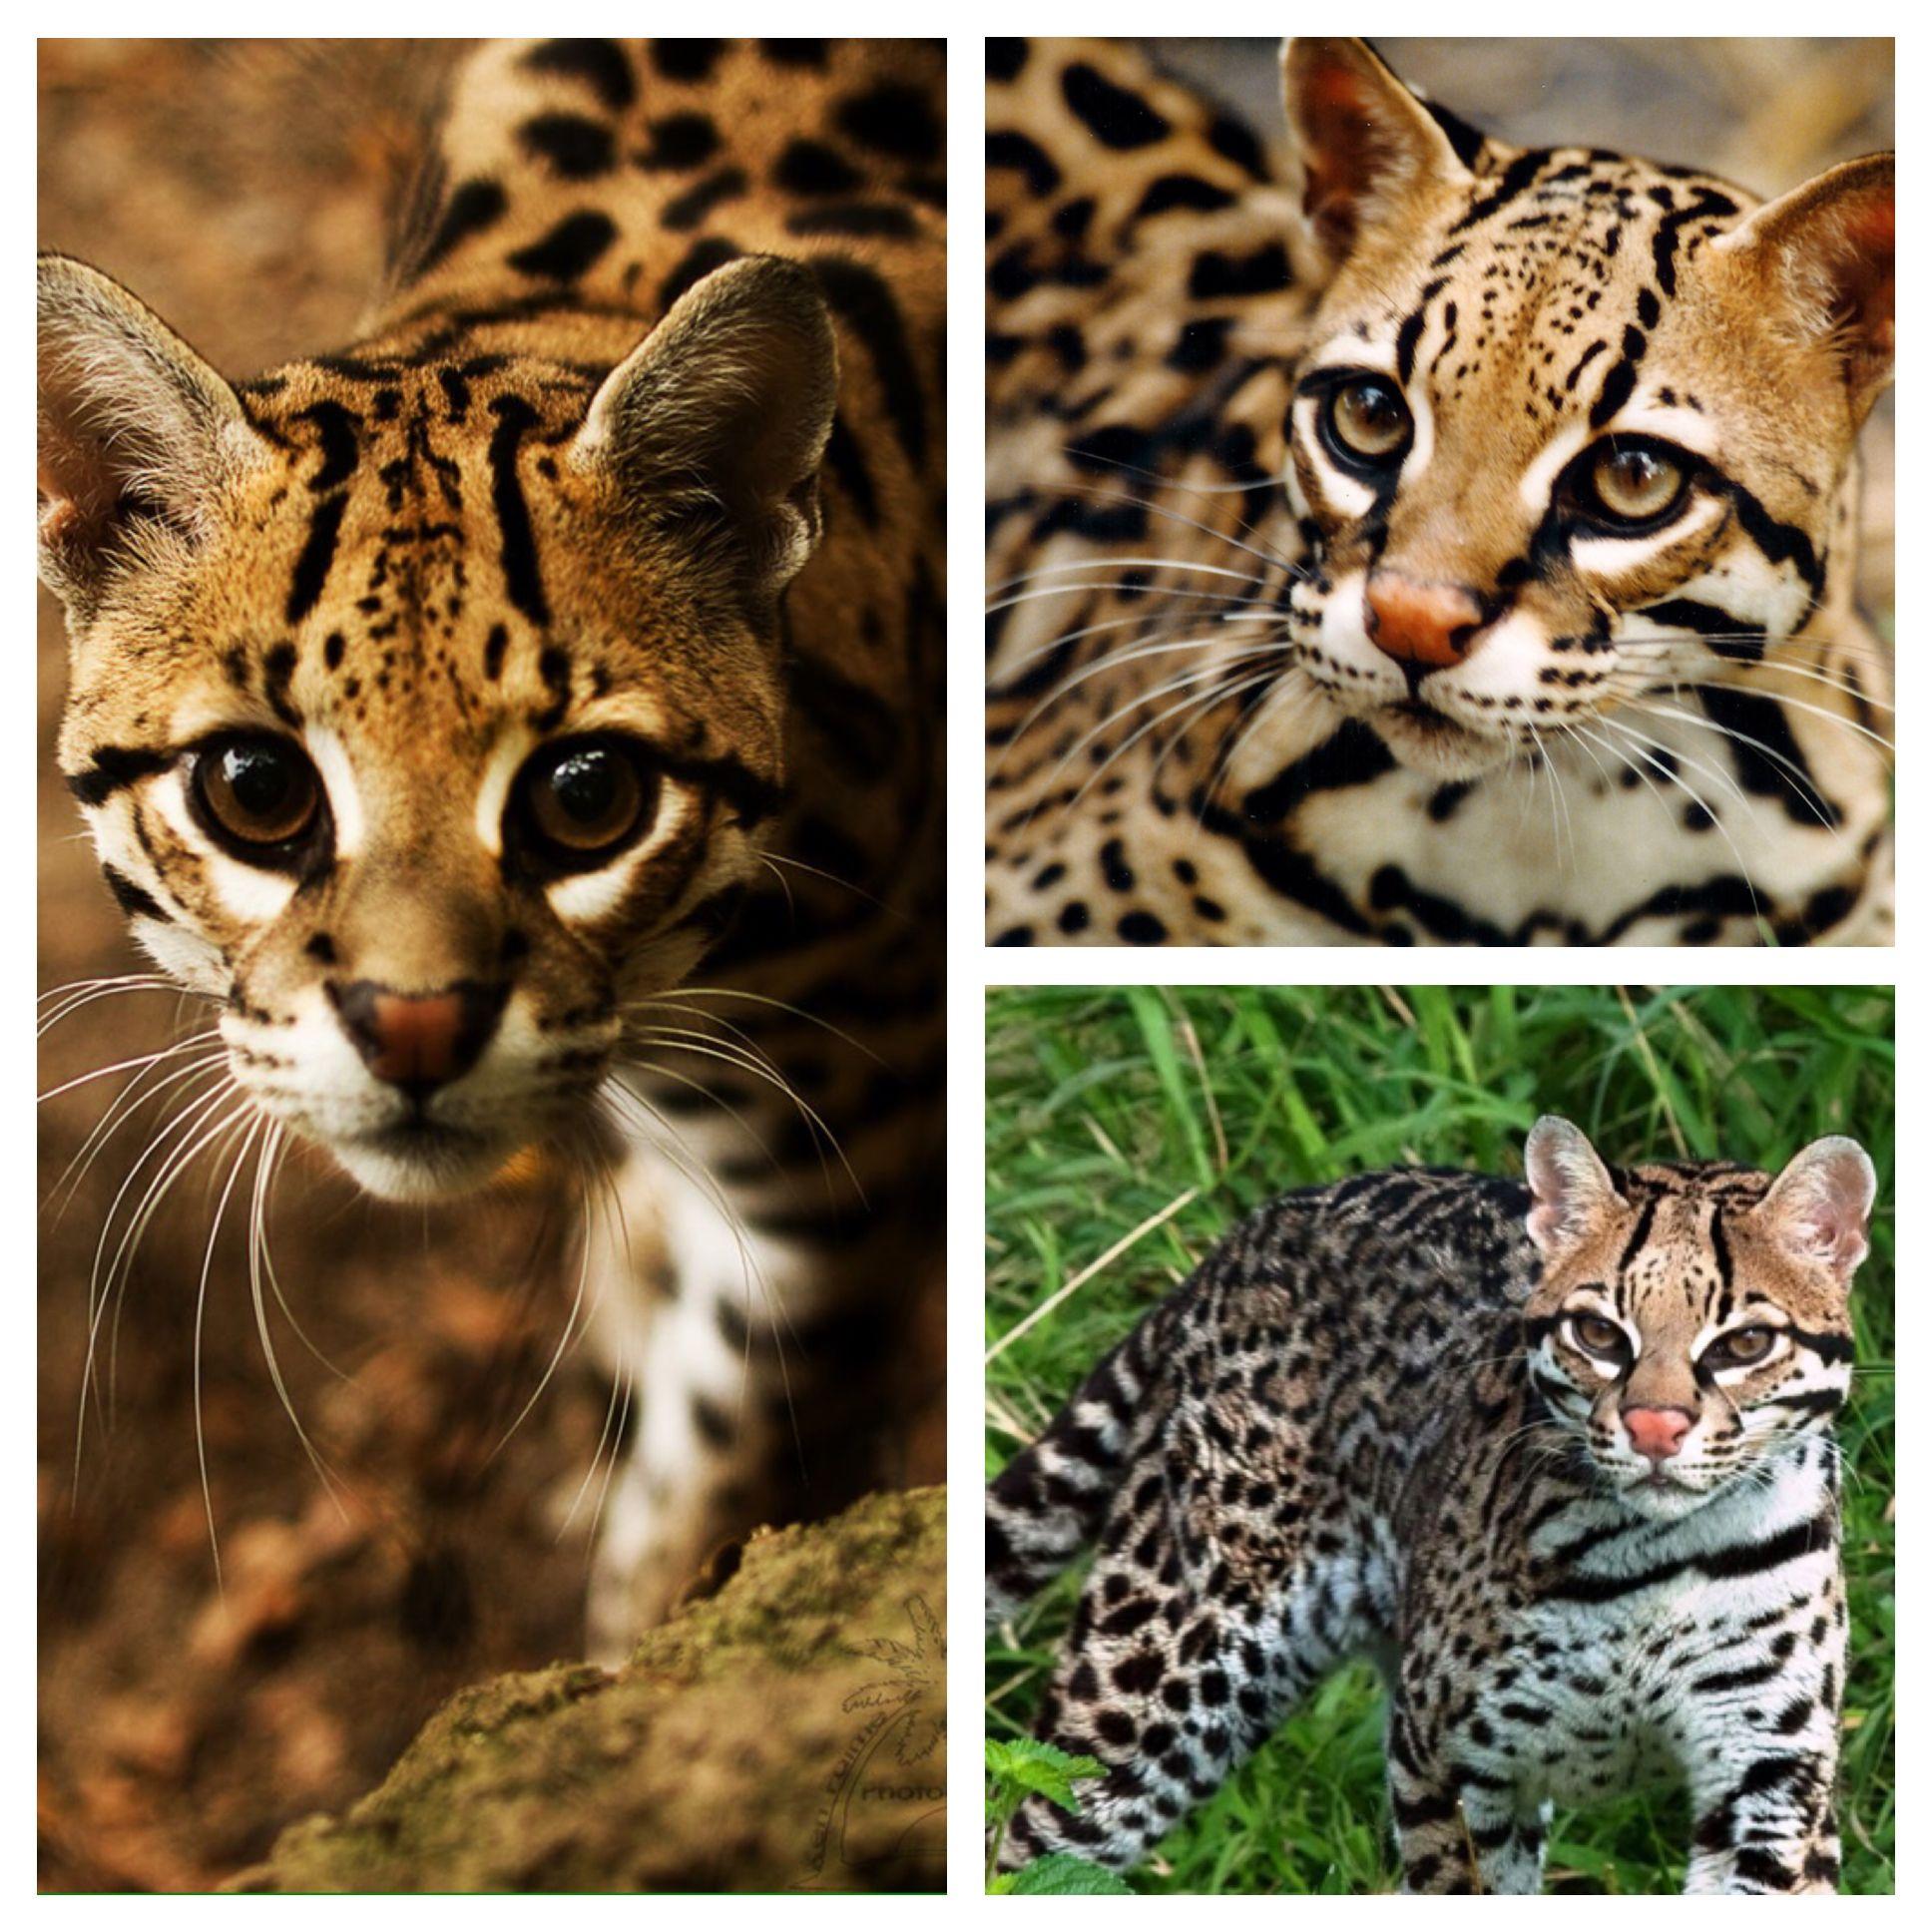 The OCELOT (leopardus pardalis) also known as the dwarf